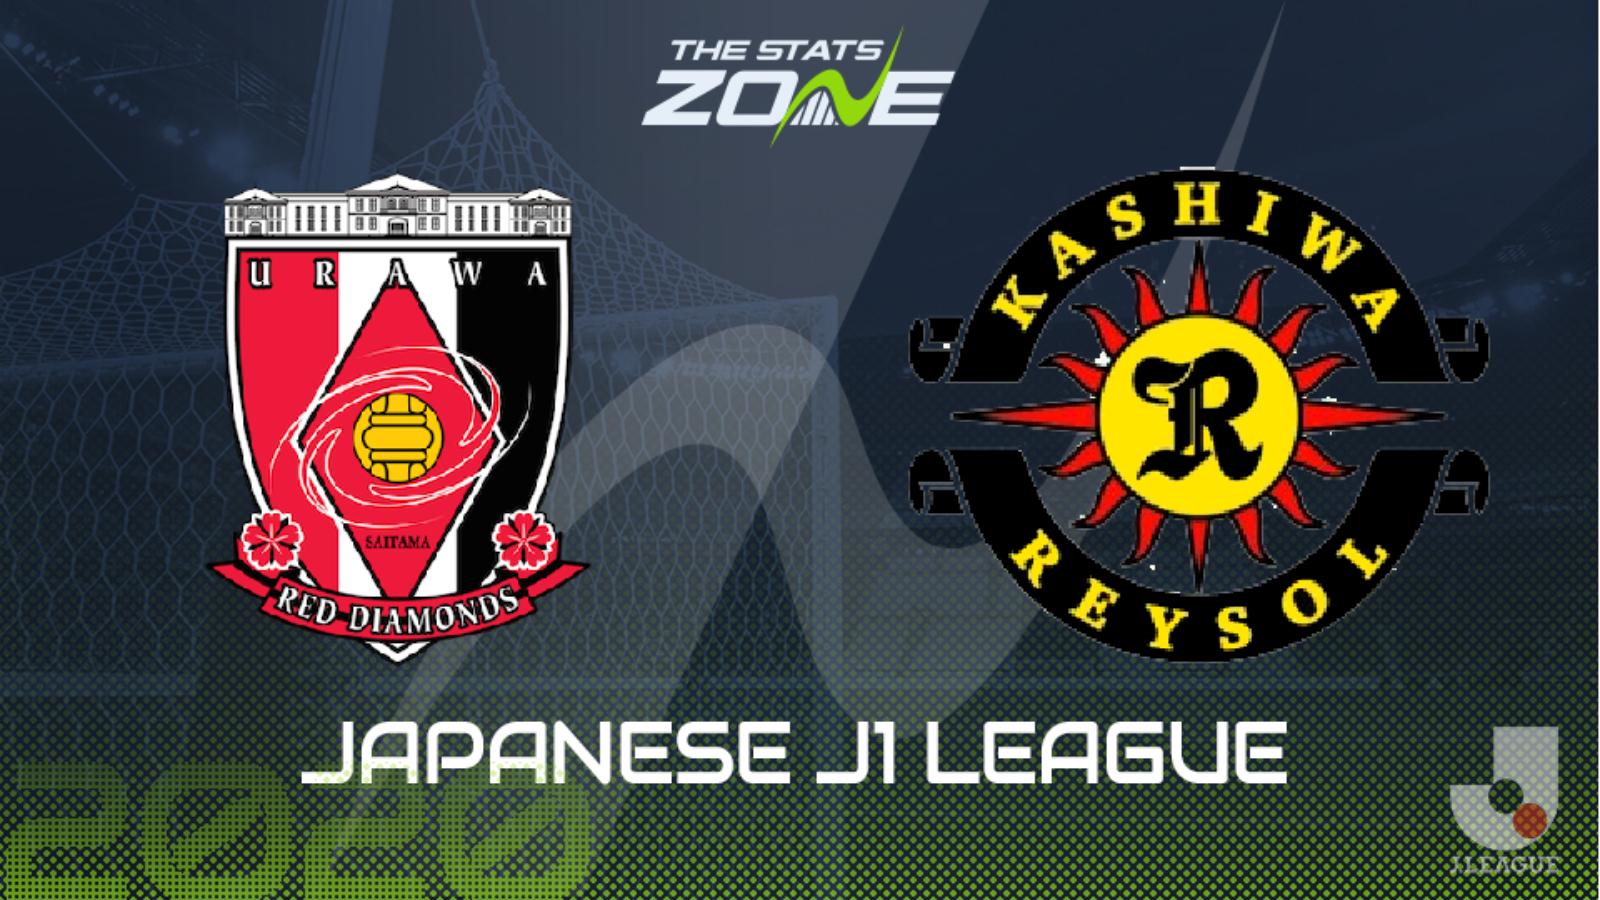 Urawa red diamonds vs kashiwa reysol bettingexpert football chisholm betting rules